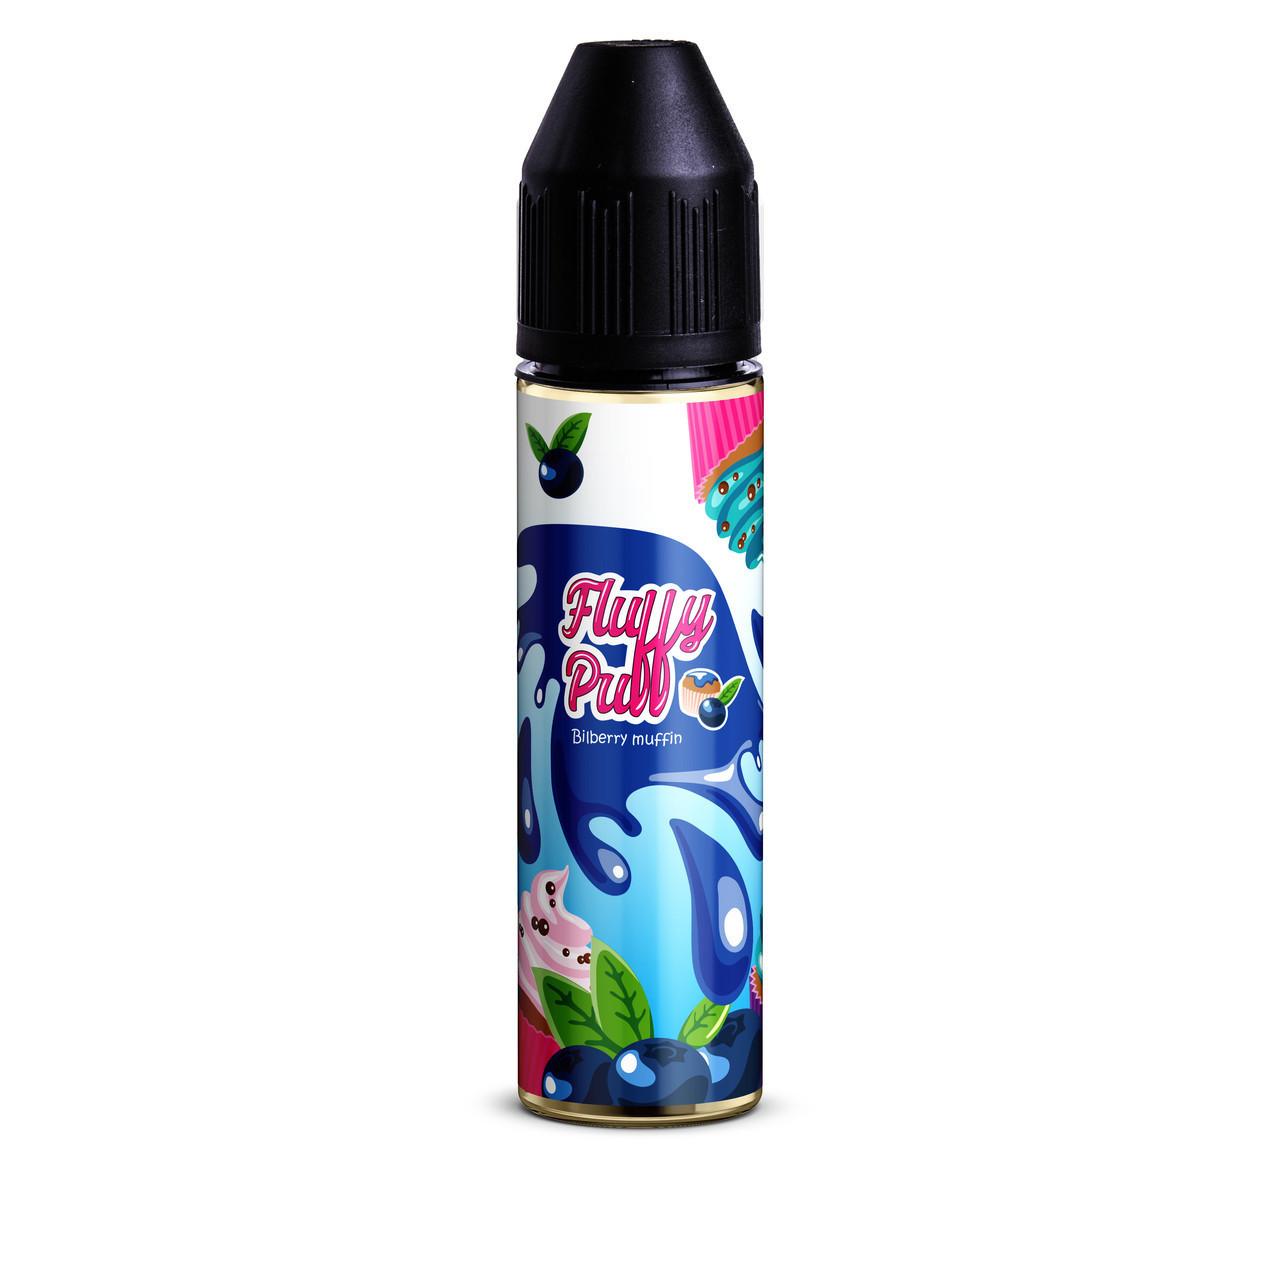 Жидкость для электронных сигарет Fluffy Puff Bilberry Muffin 1.5 мг 60 мл